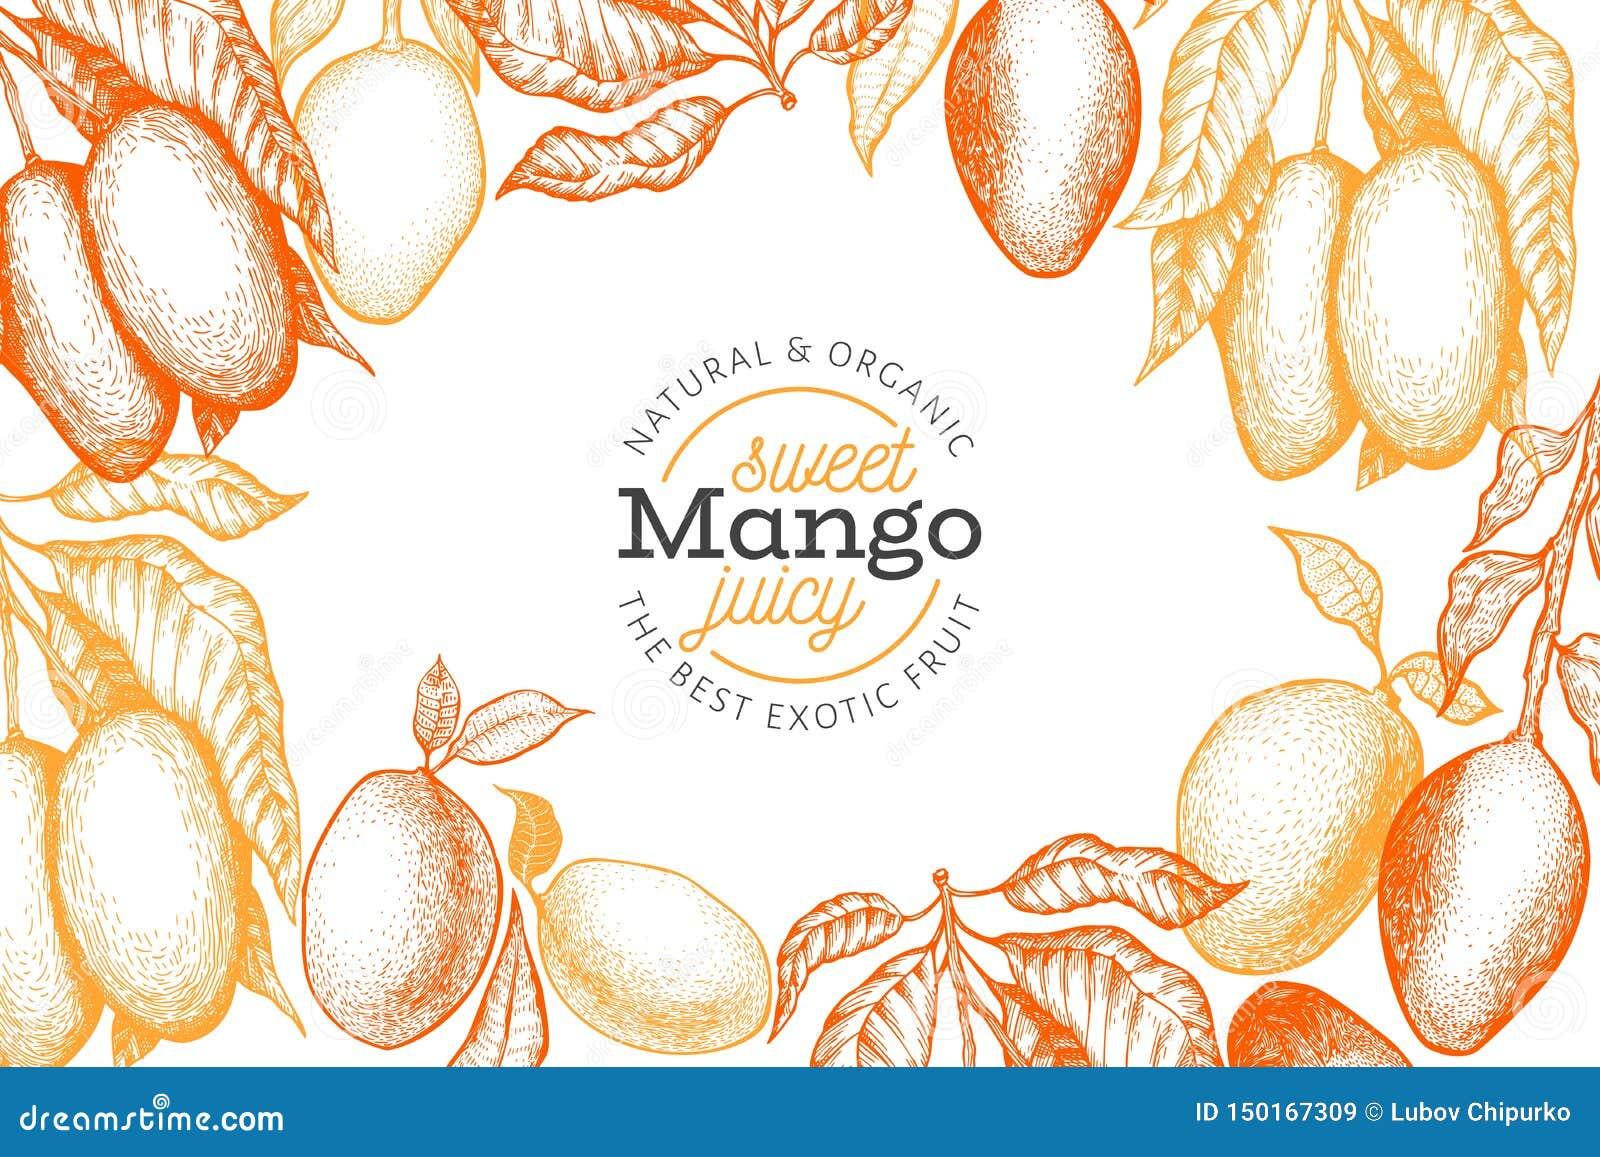 Mango design template. Hand drawn vector tropic fruit illustration. Engraved style fruit. Vintage exotic food banner